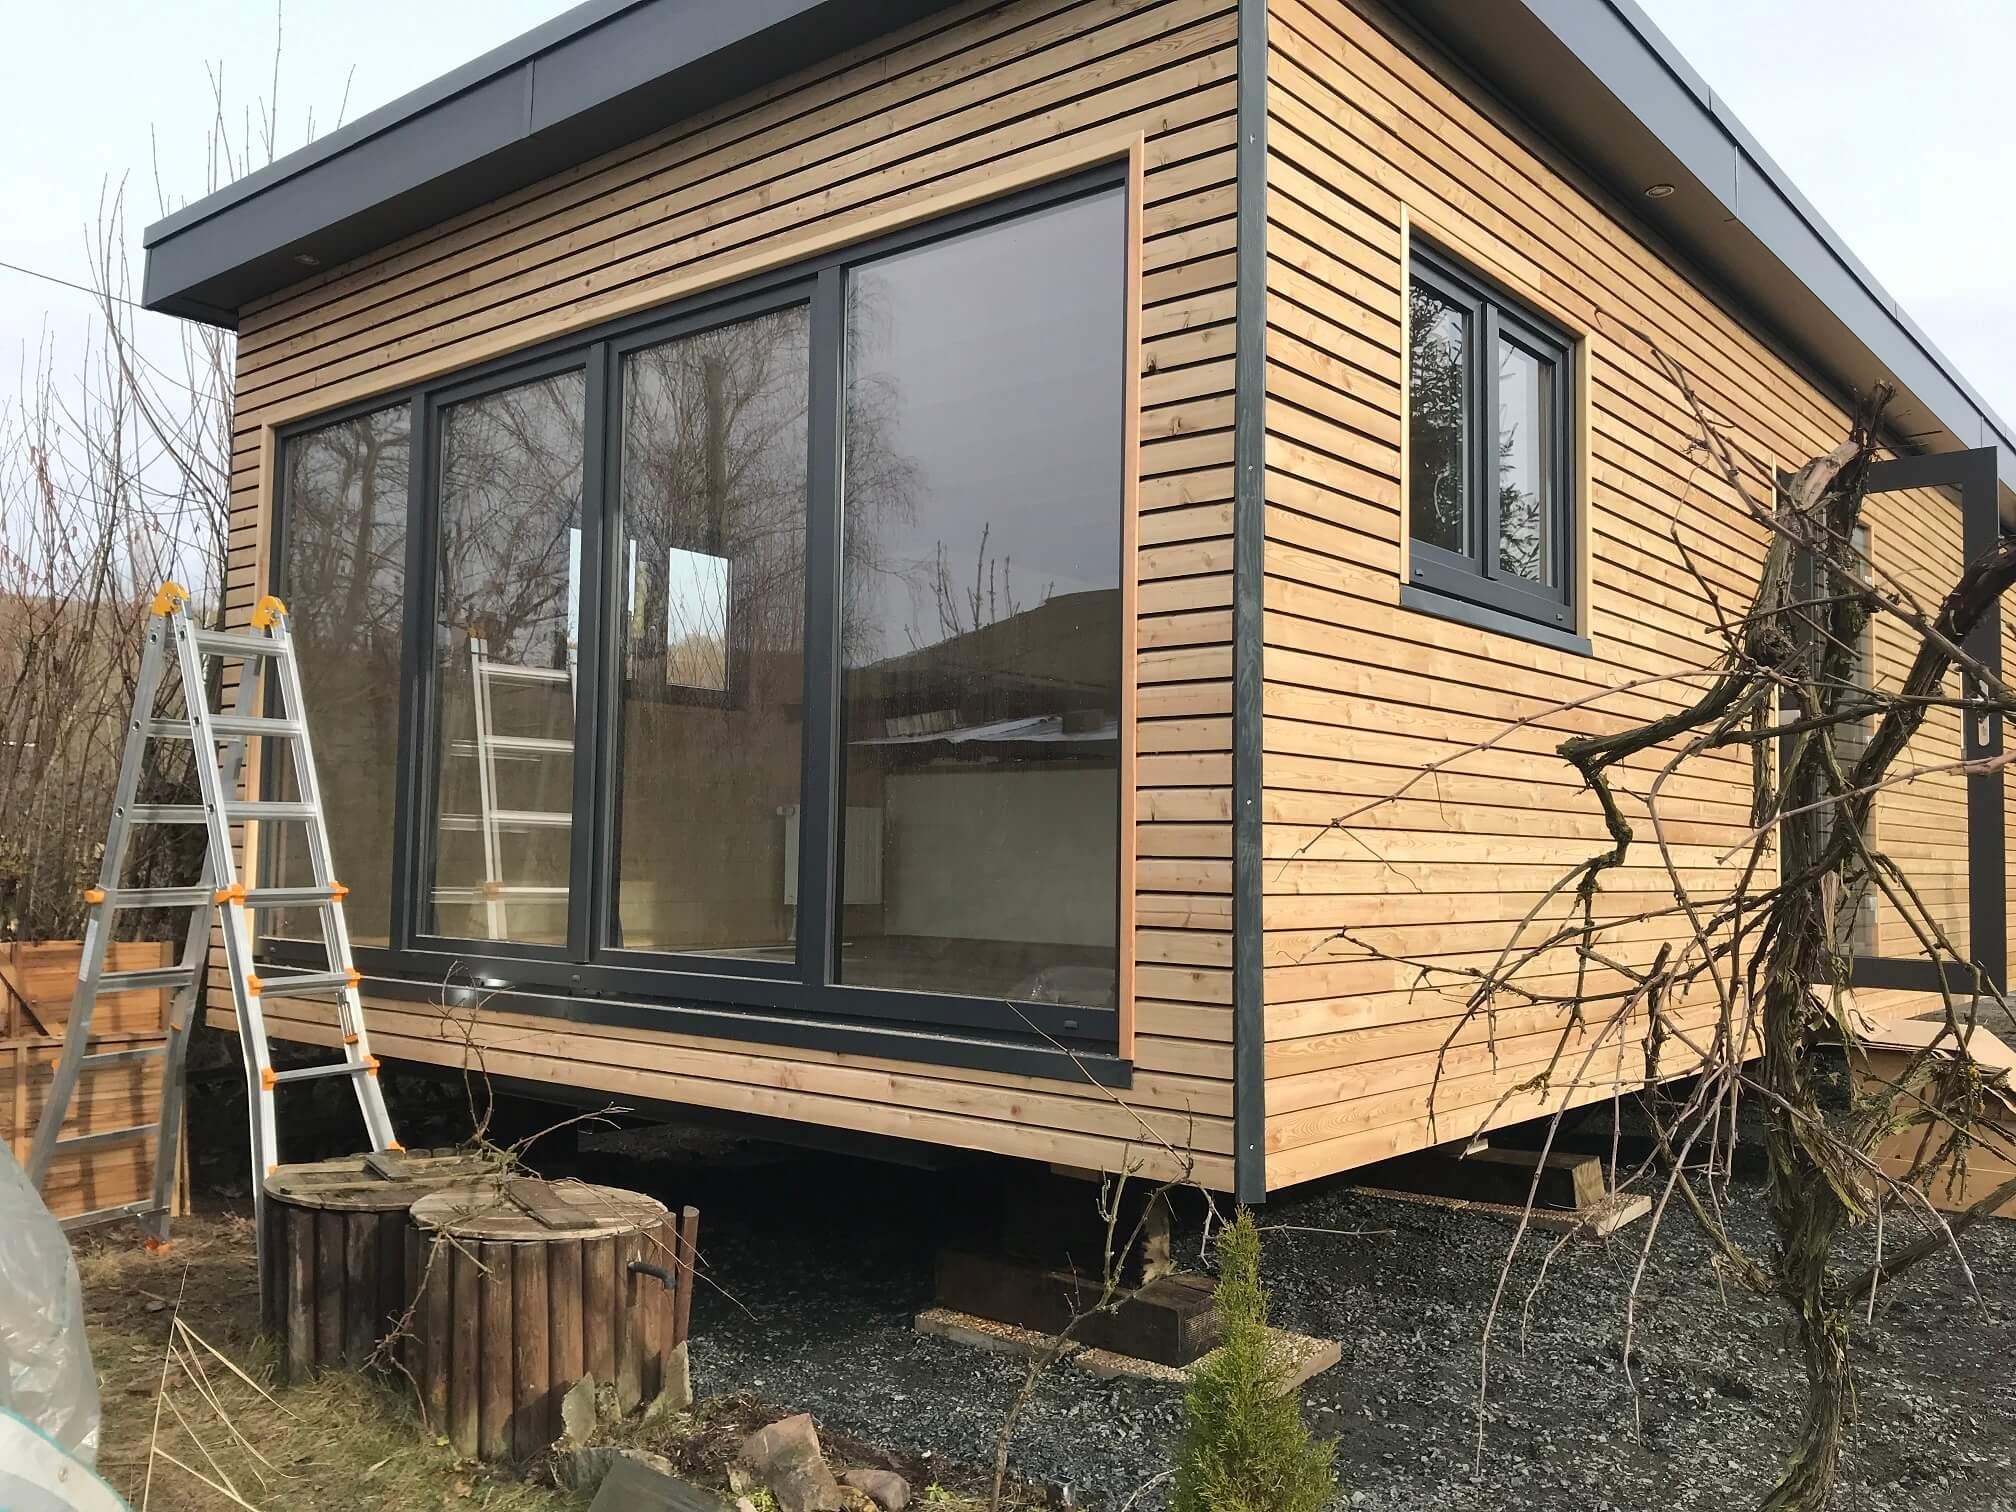 gebautes-chalet-valk-vital-camp-gmbh15